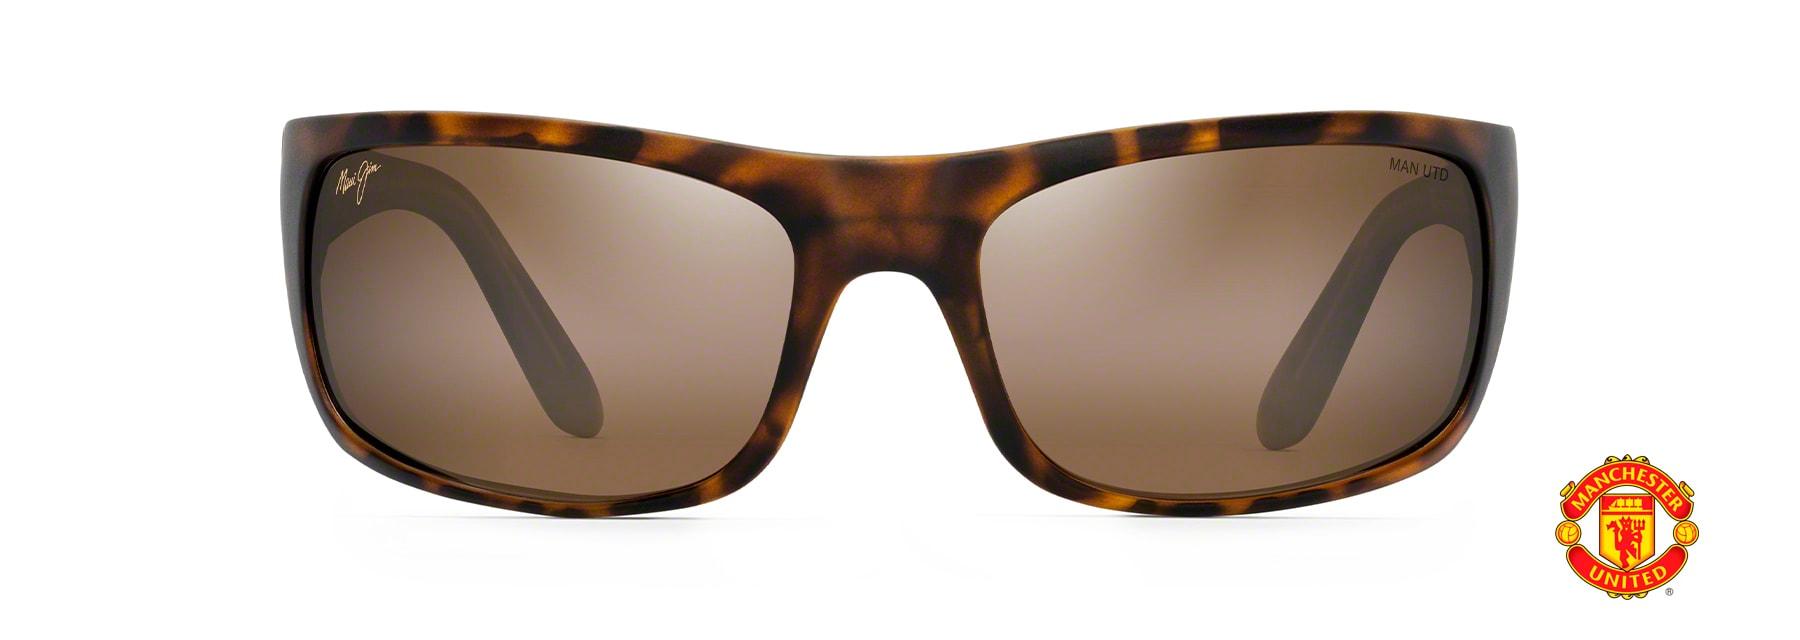 Maui Jim Peahi Rectangular Sunglasses